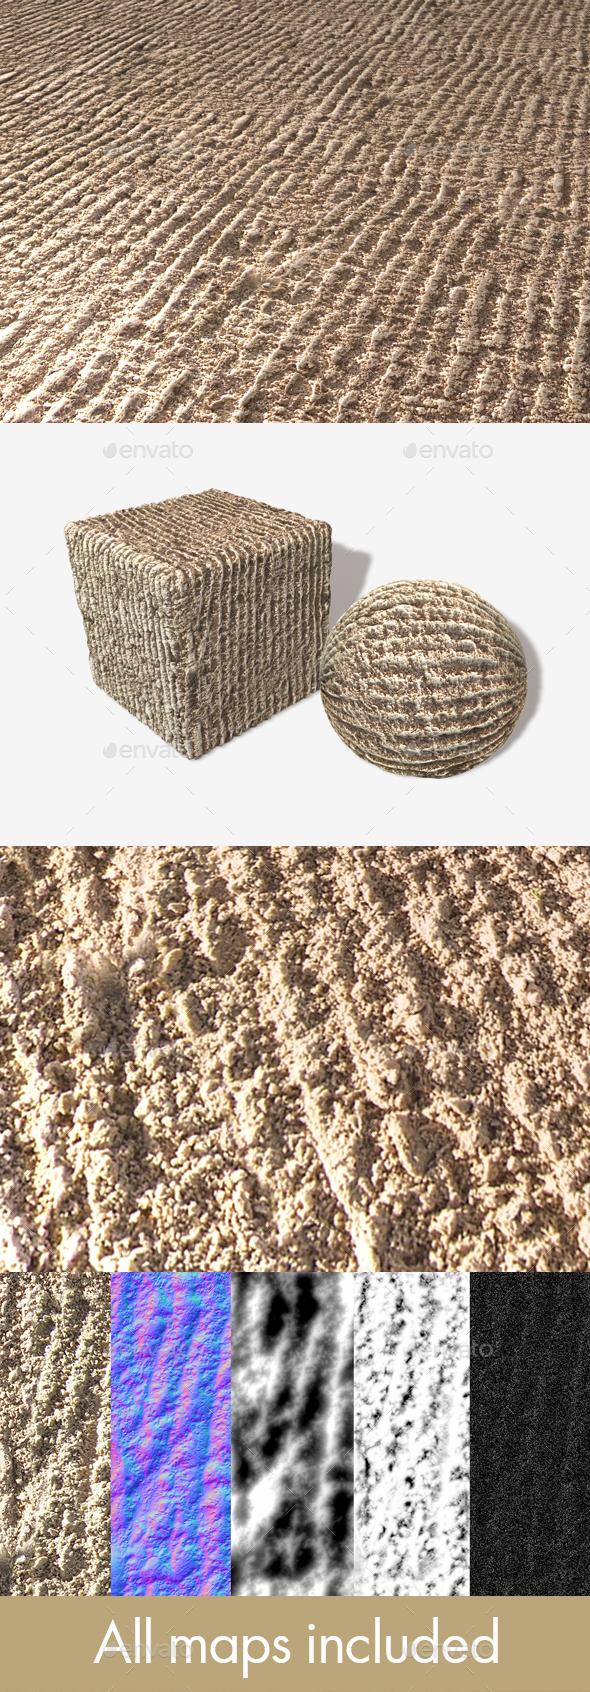 Raked Garden Sand Seamless Texture - 3DOcean Item for Sale